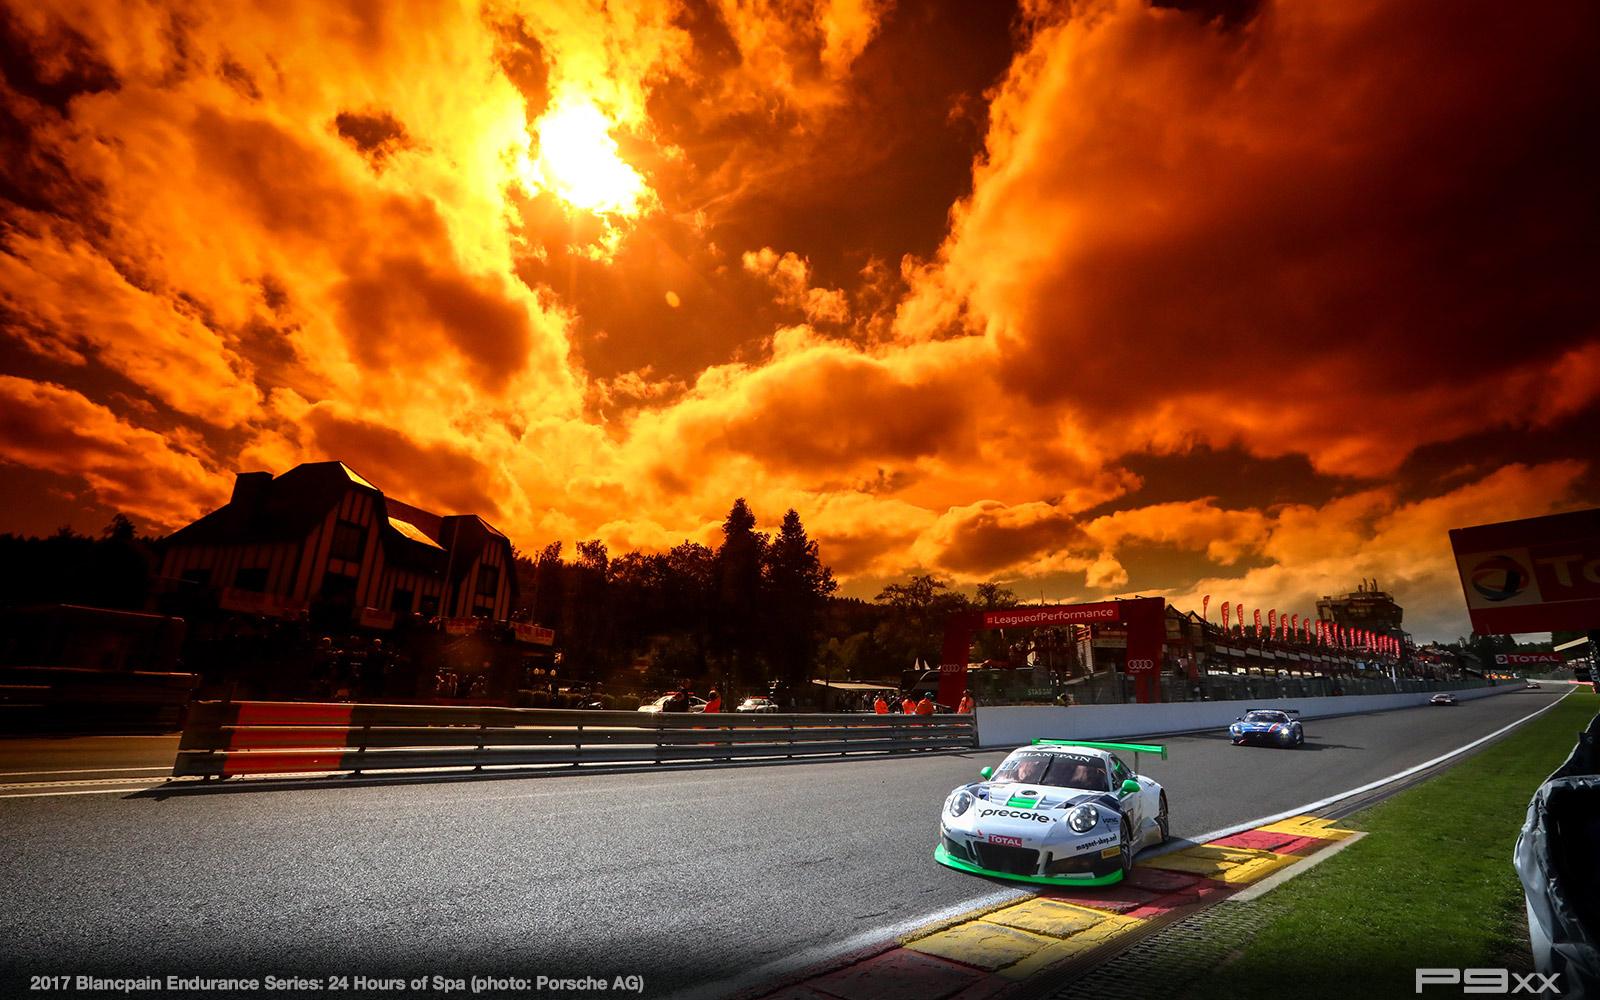 2017-24-Hours-of-Spa-Porsche-355